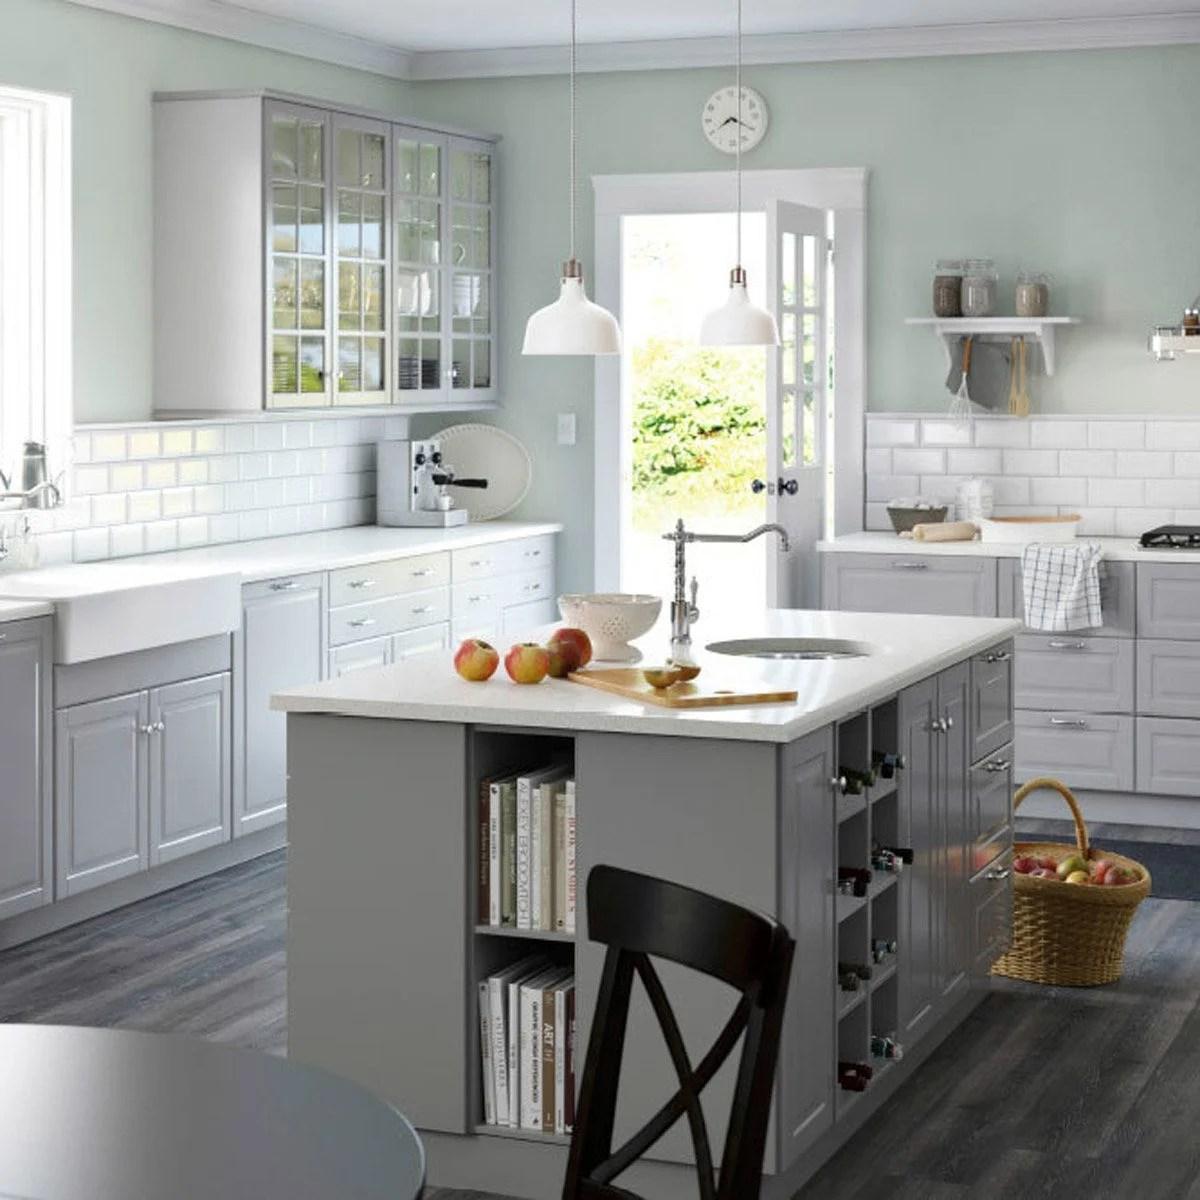 12 inspiring kitchen island ideas — the family handyman